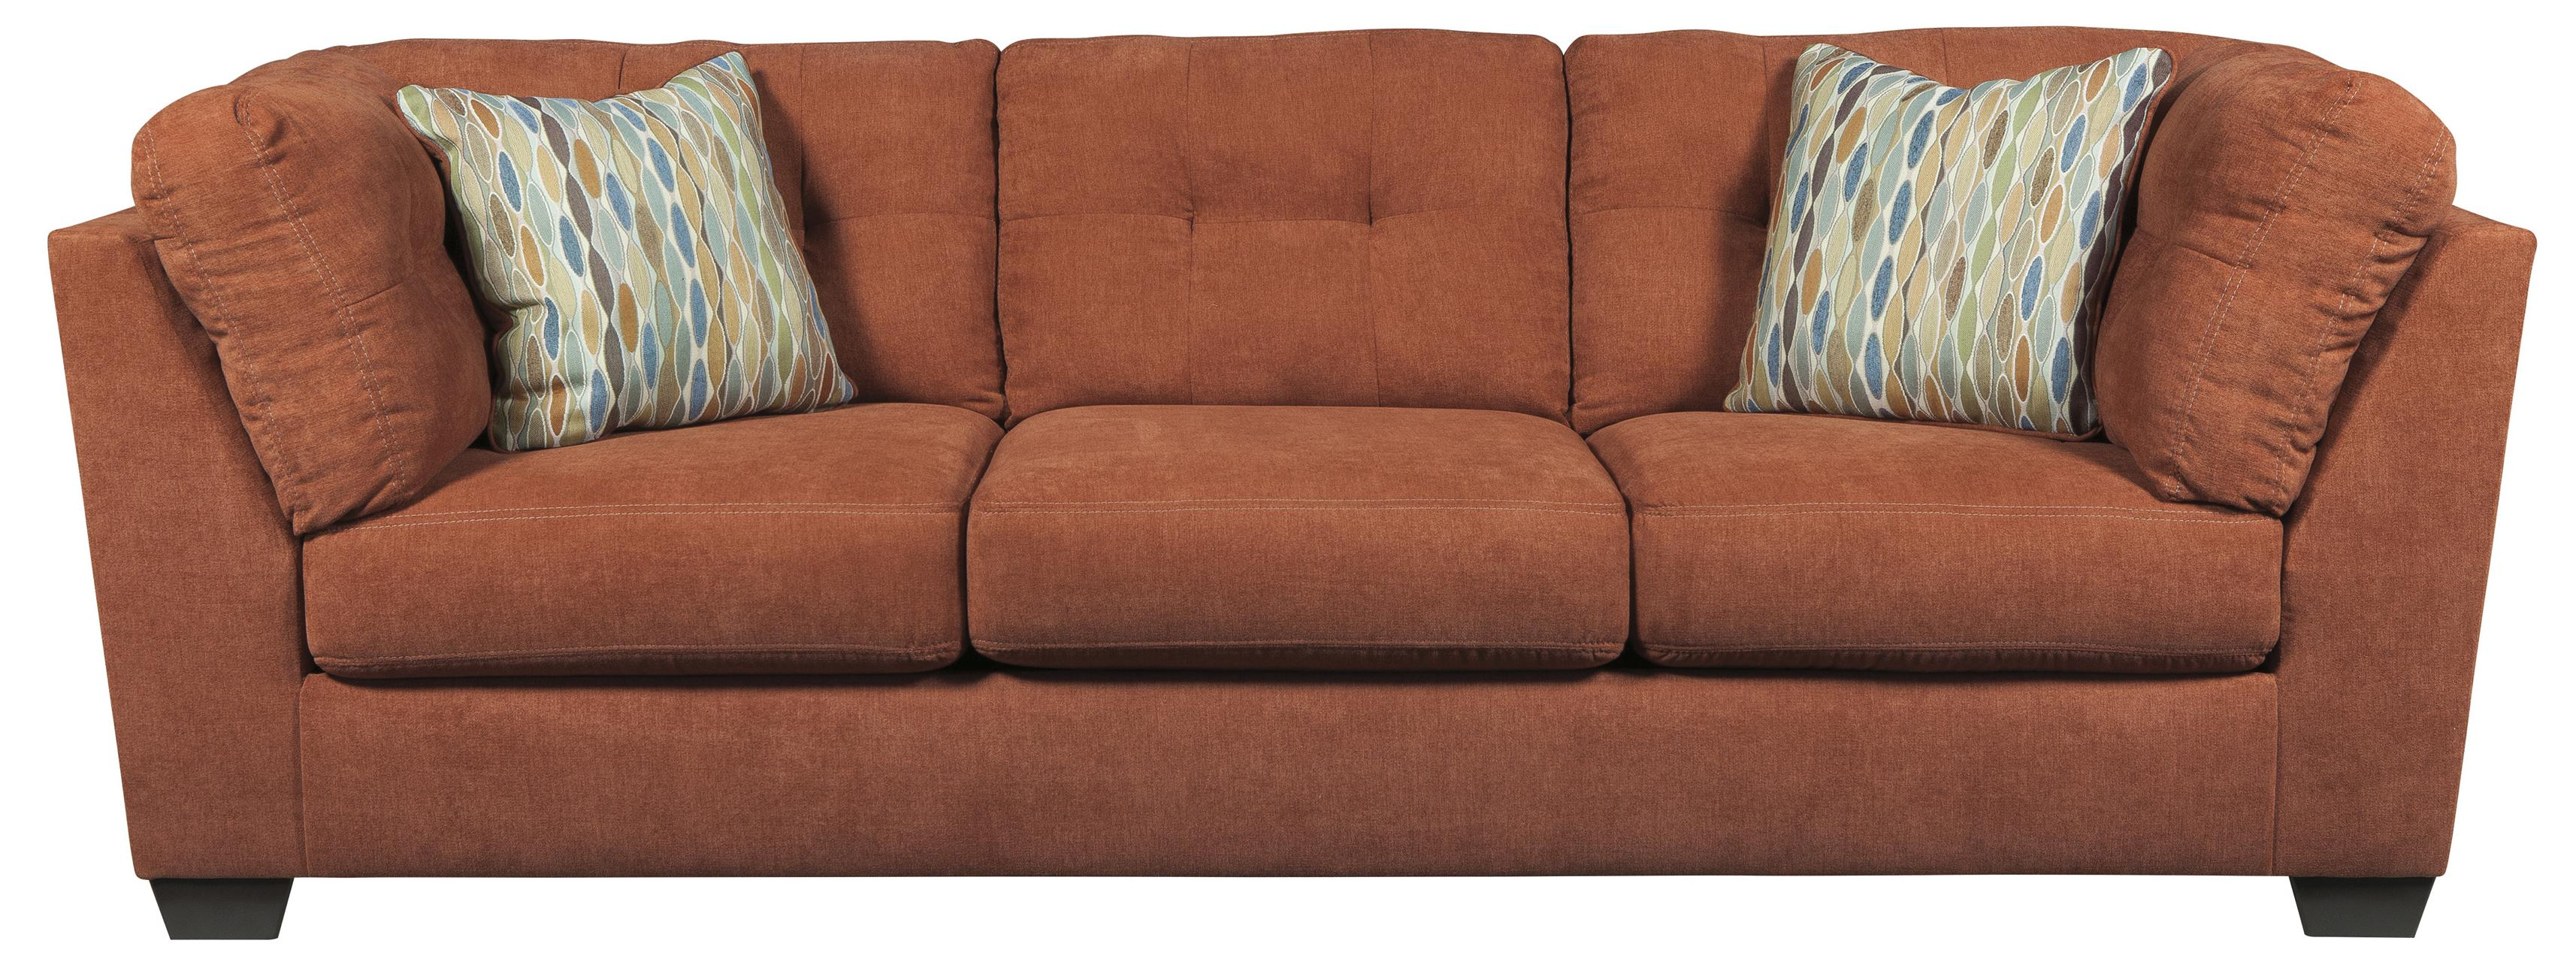 Ashley/Benchcraft Delta City - Rust Sofa - Item Number: 1970138